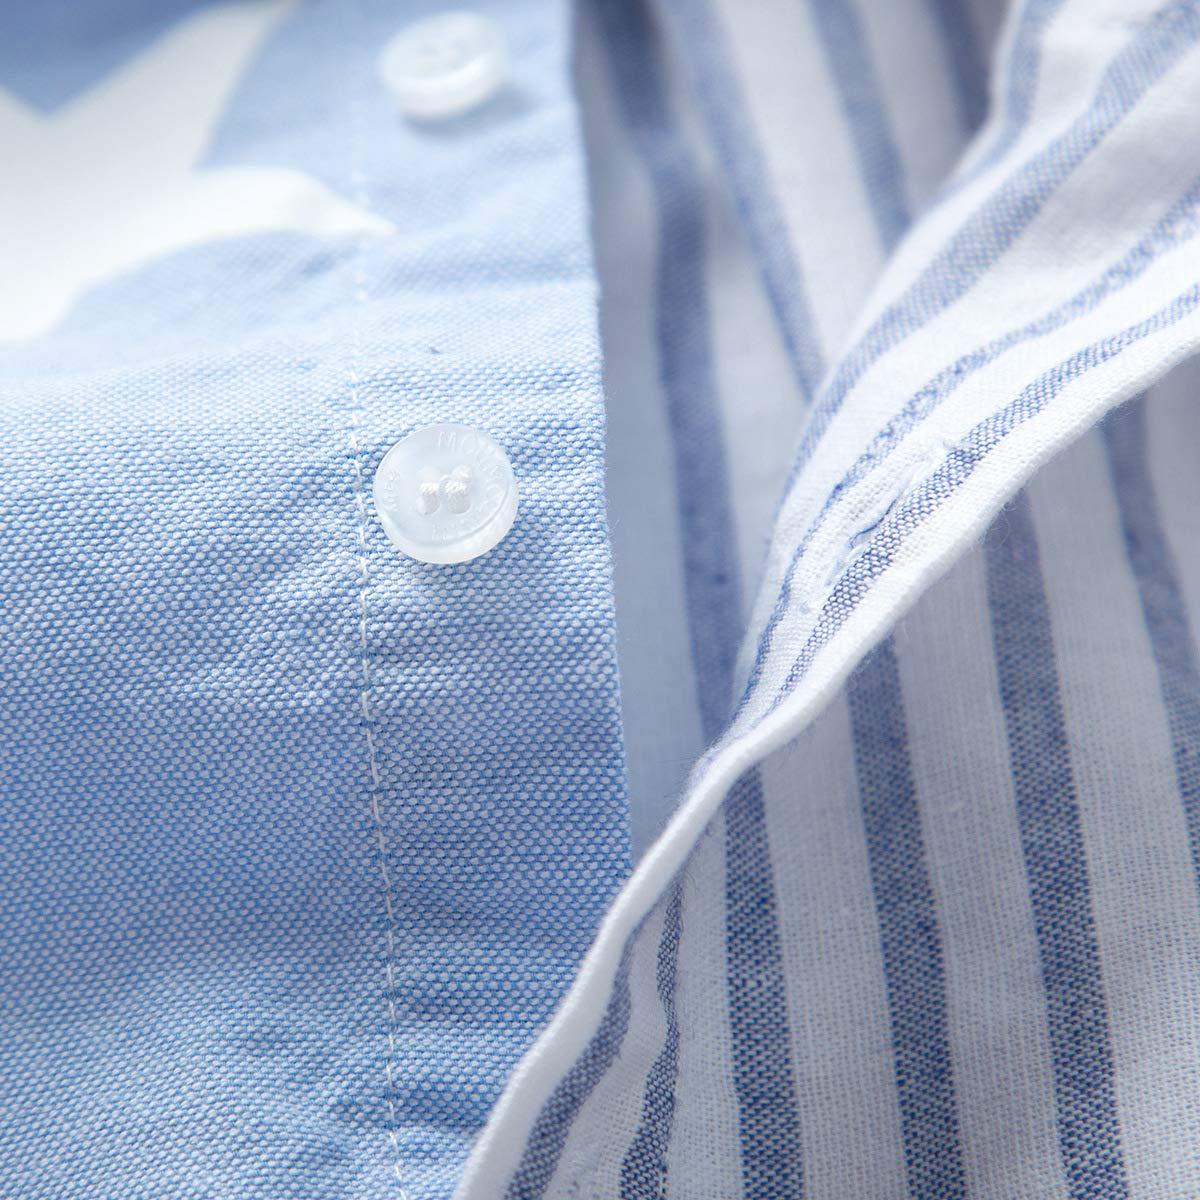 XINXINHAIHE Kid Boy Formal Outfit 3pcs Stripe Star Print Splice Shirt+Denim Pants+Bowtie